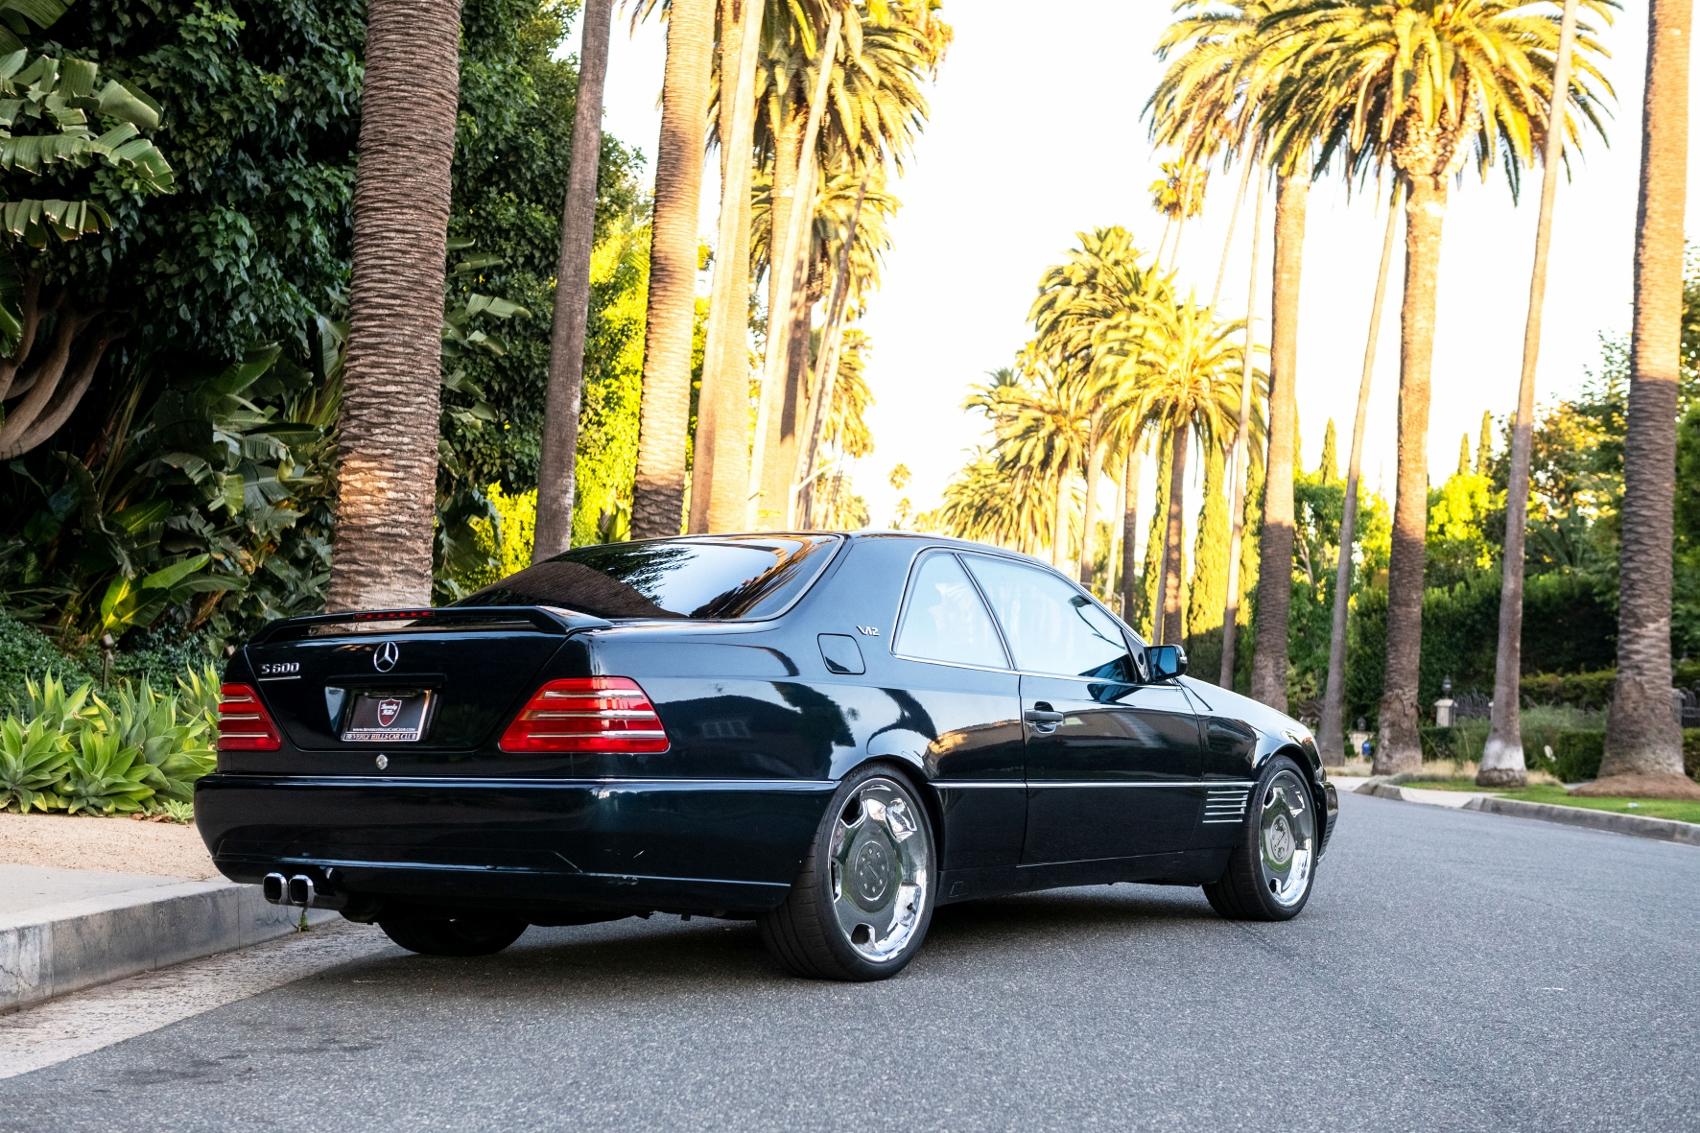 Pozrite si Mercedes S600 Michaela Jordana z roku 1996